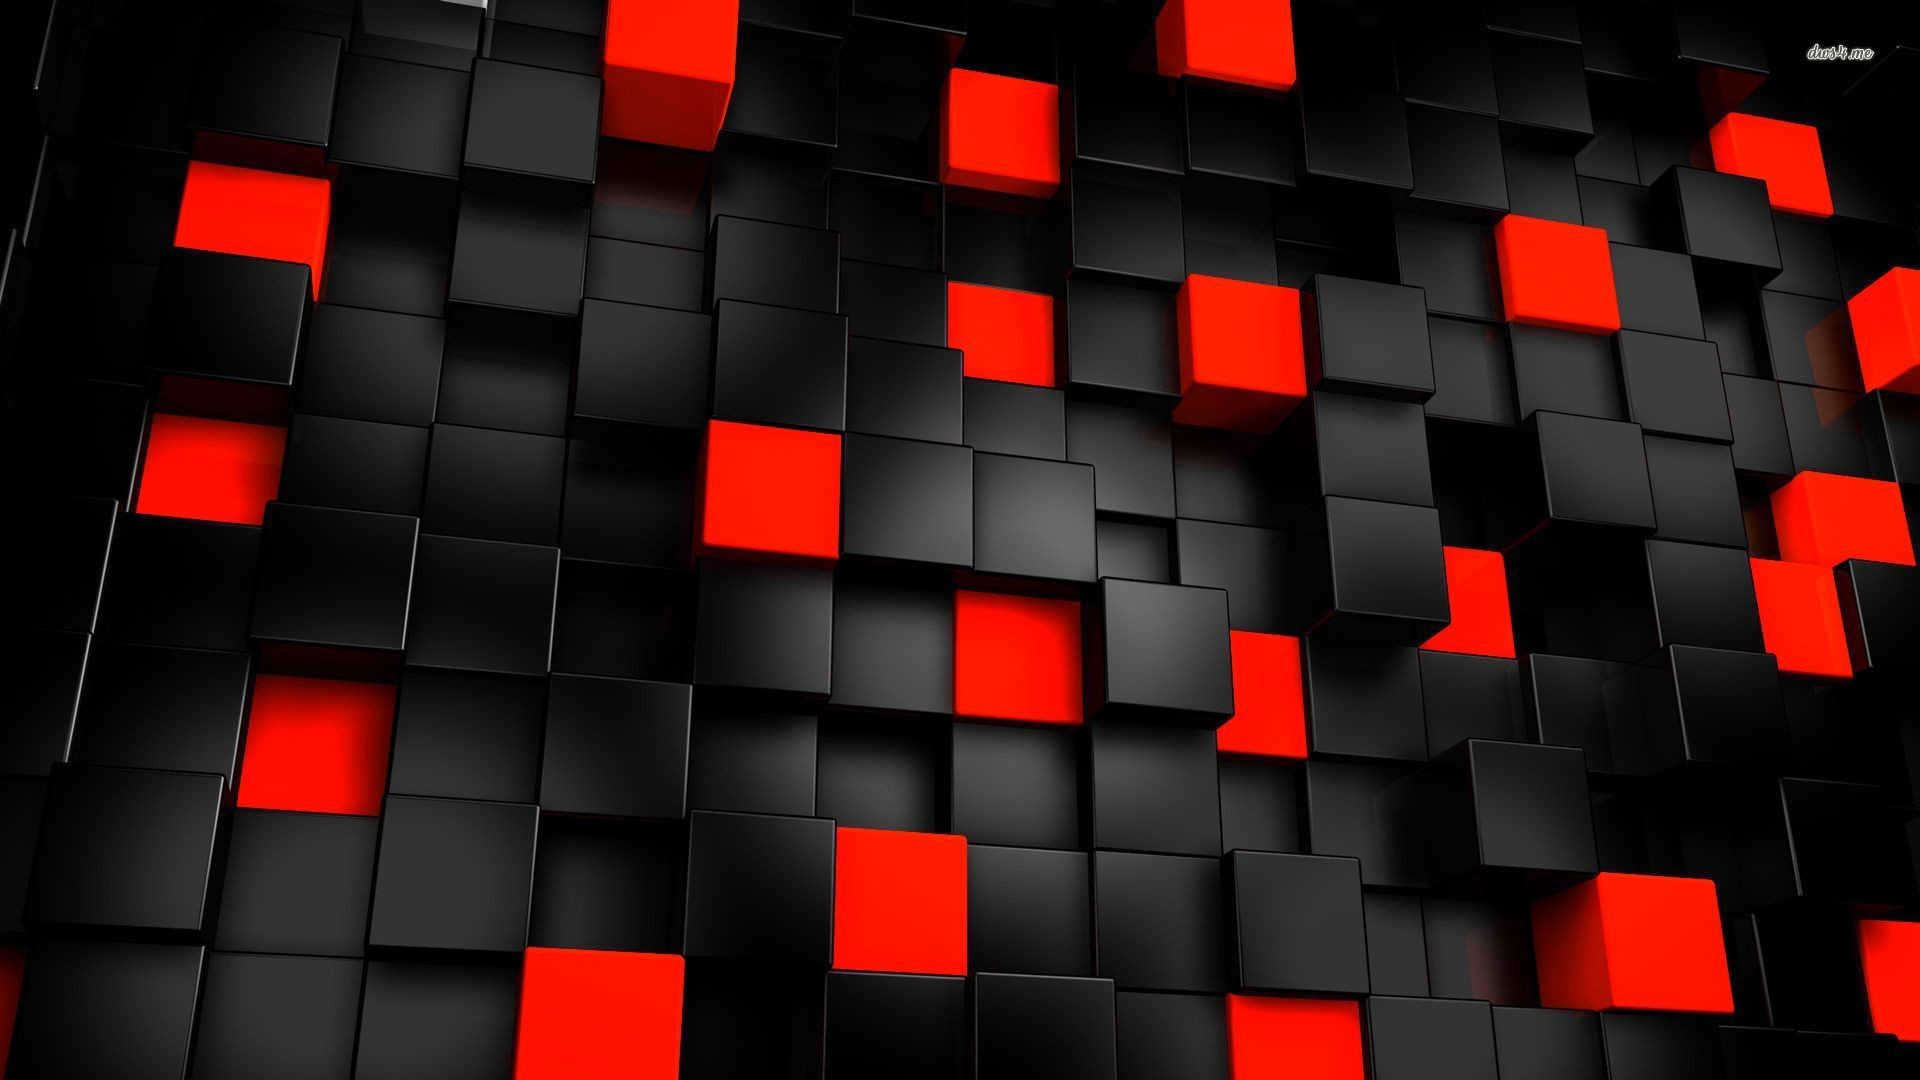 Black Cube Wallpaper 73 Images